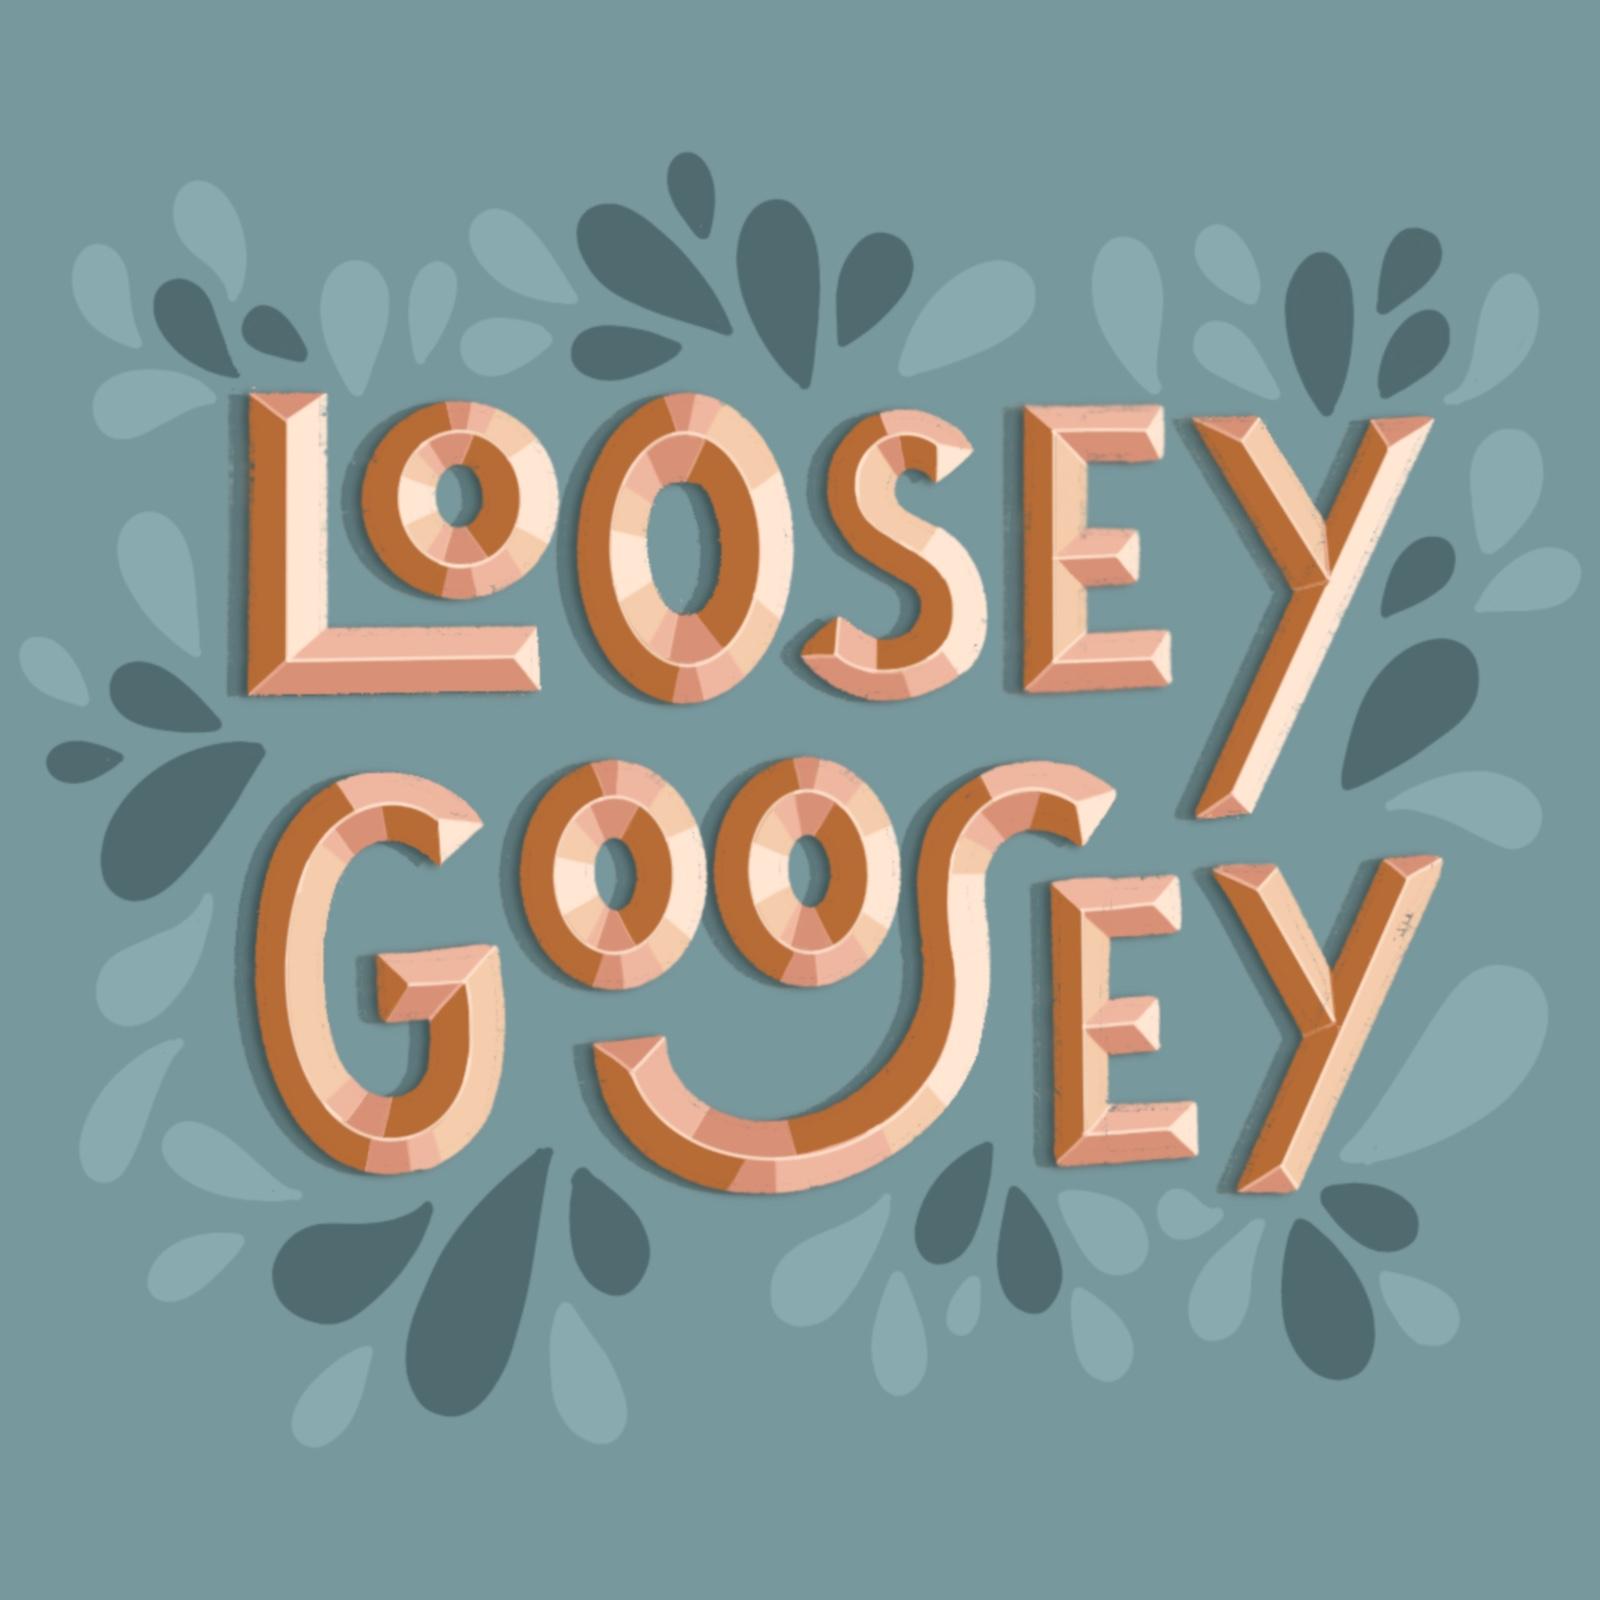 Loosey Goosey - Maeve Gonder